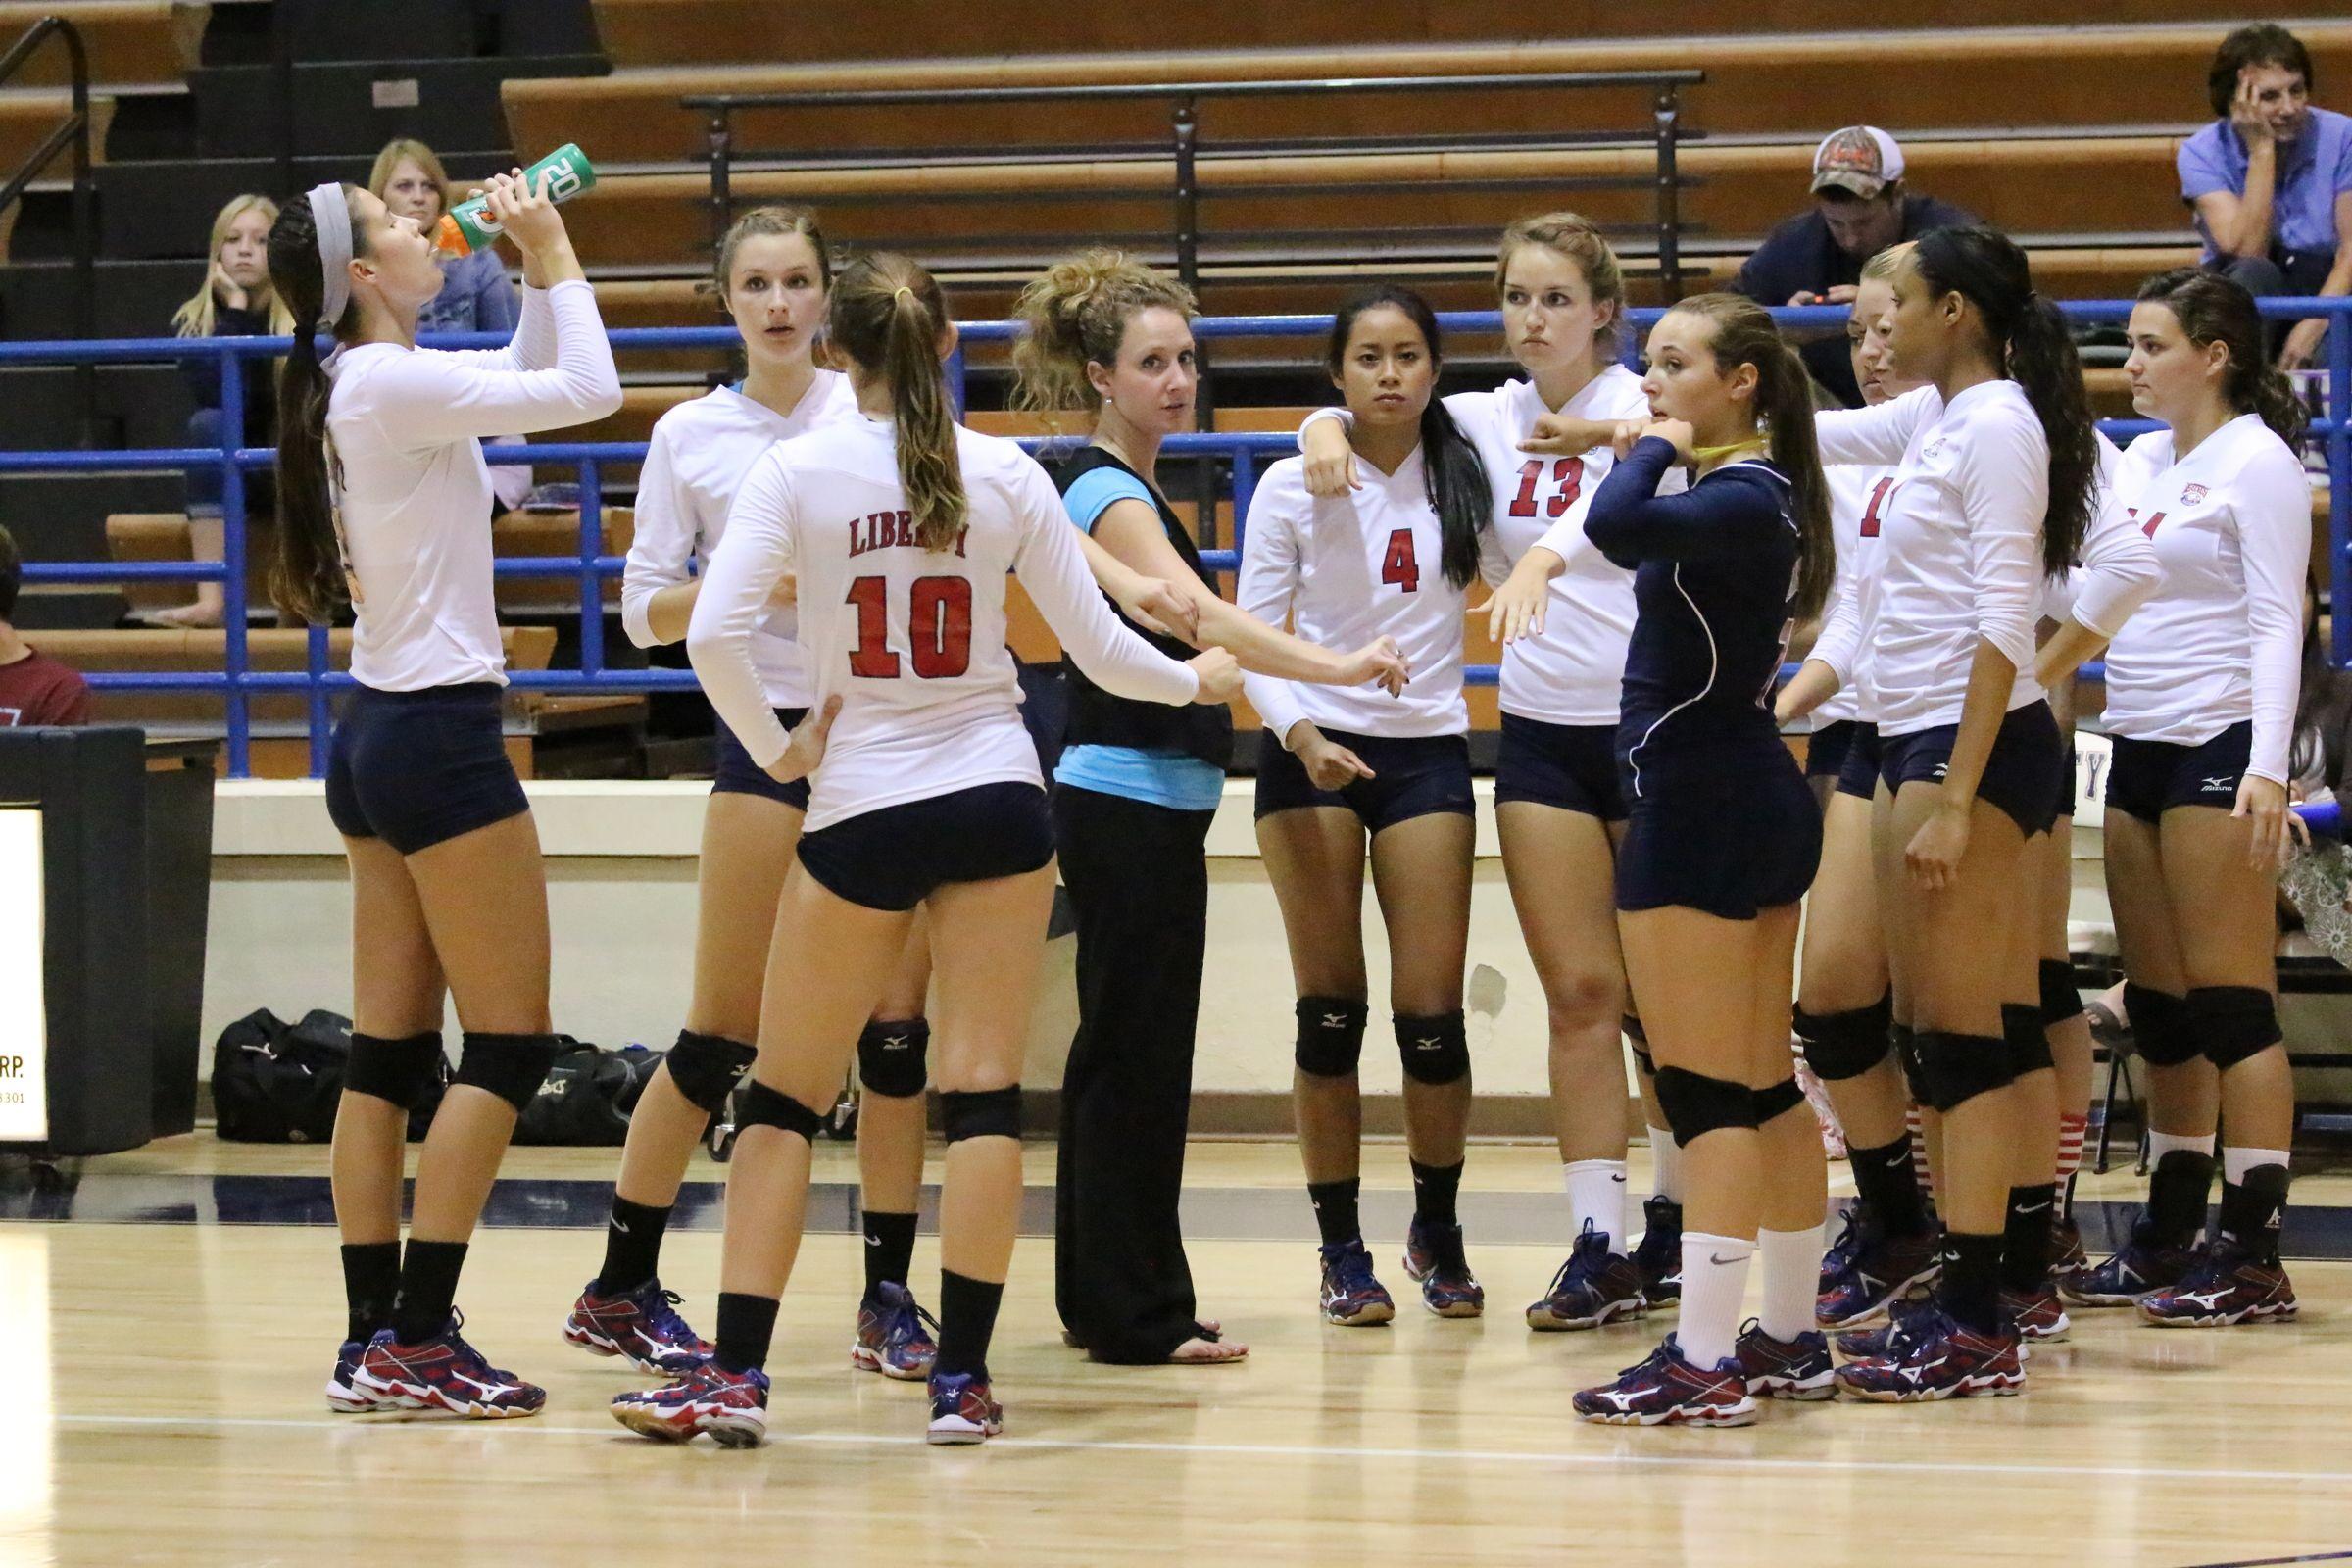 2015 Lhs Volleyball Volleyball Liberty High School High School